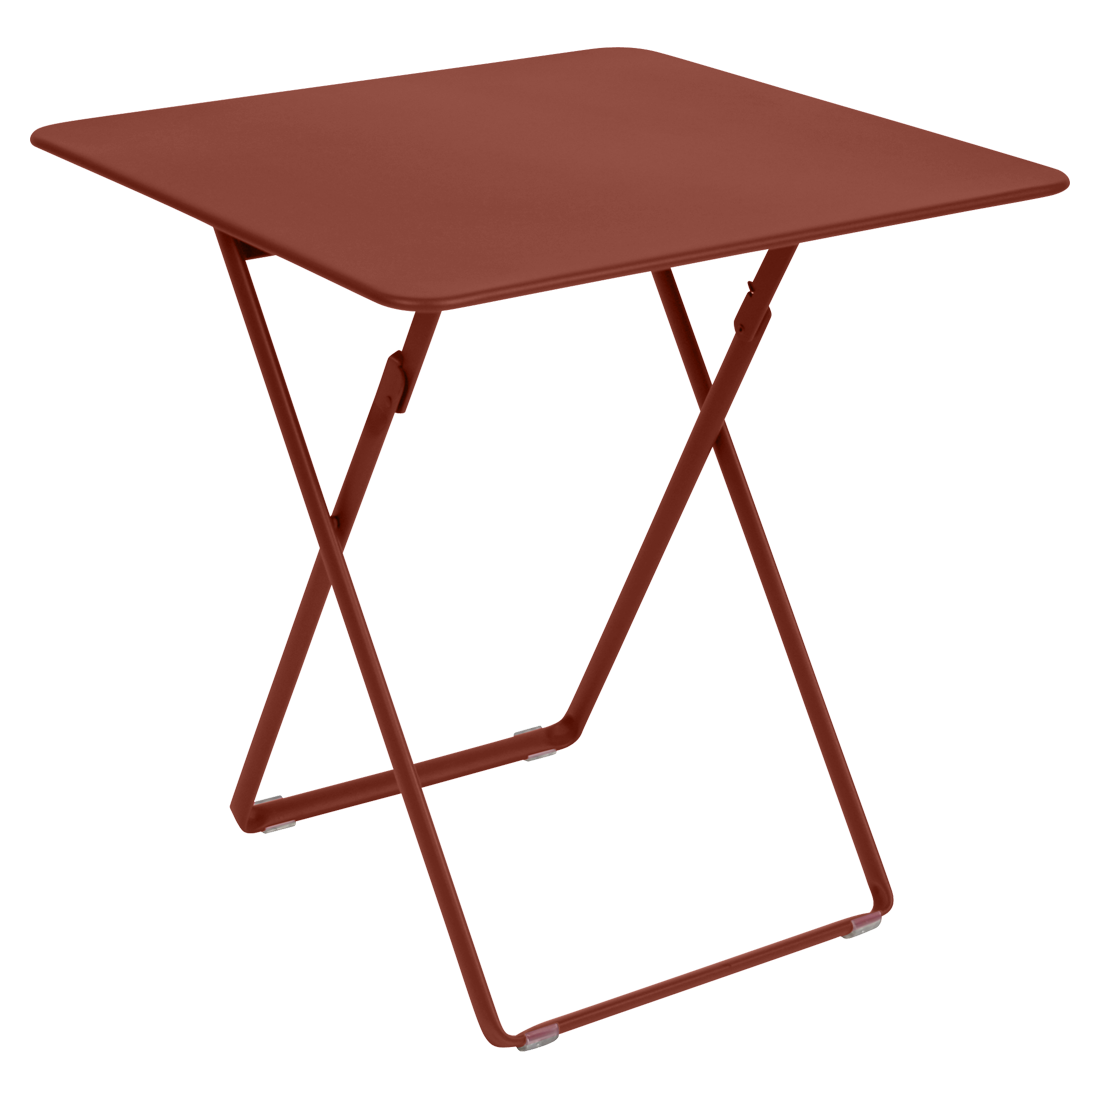 Table 71 x 71 cm plein air ocre rouge